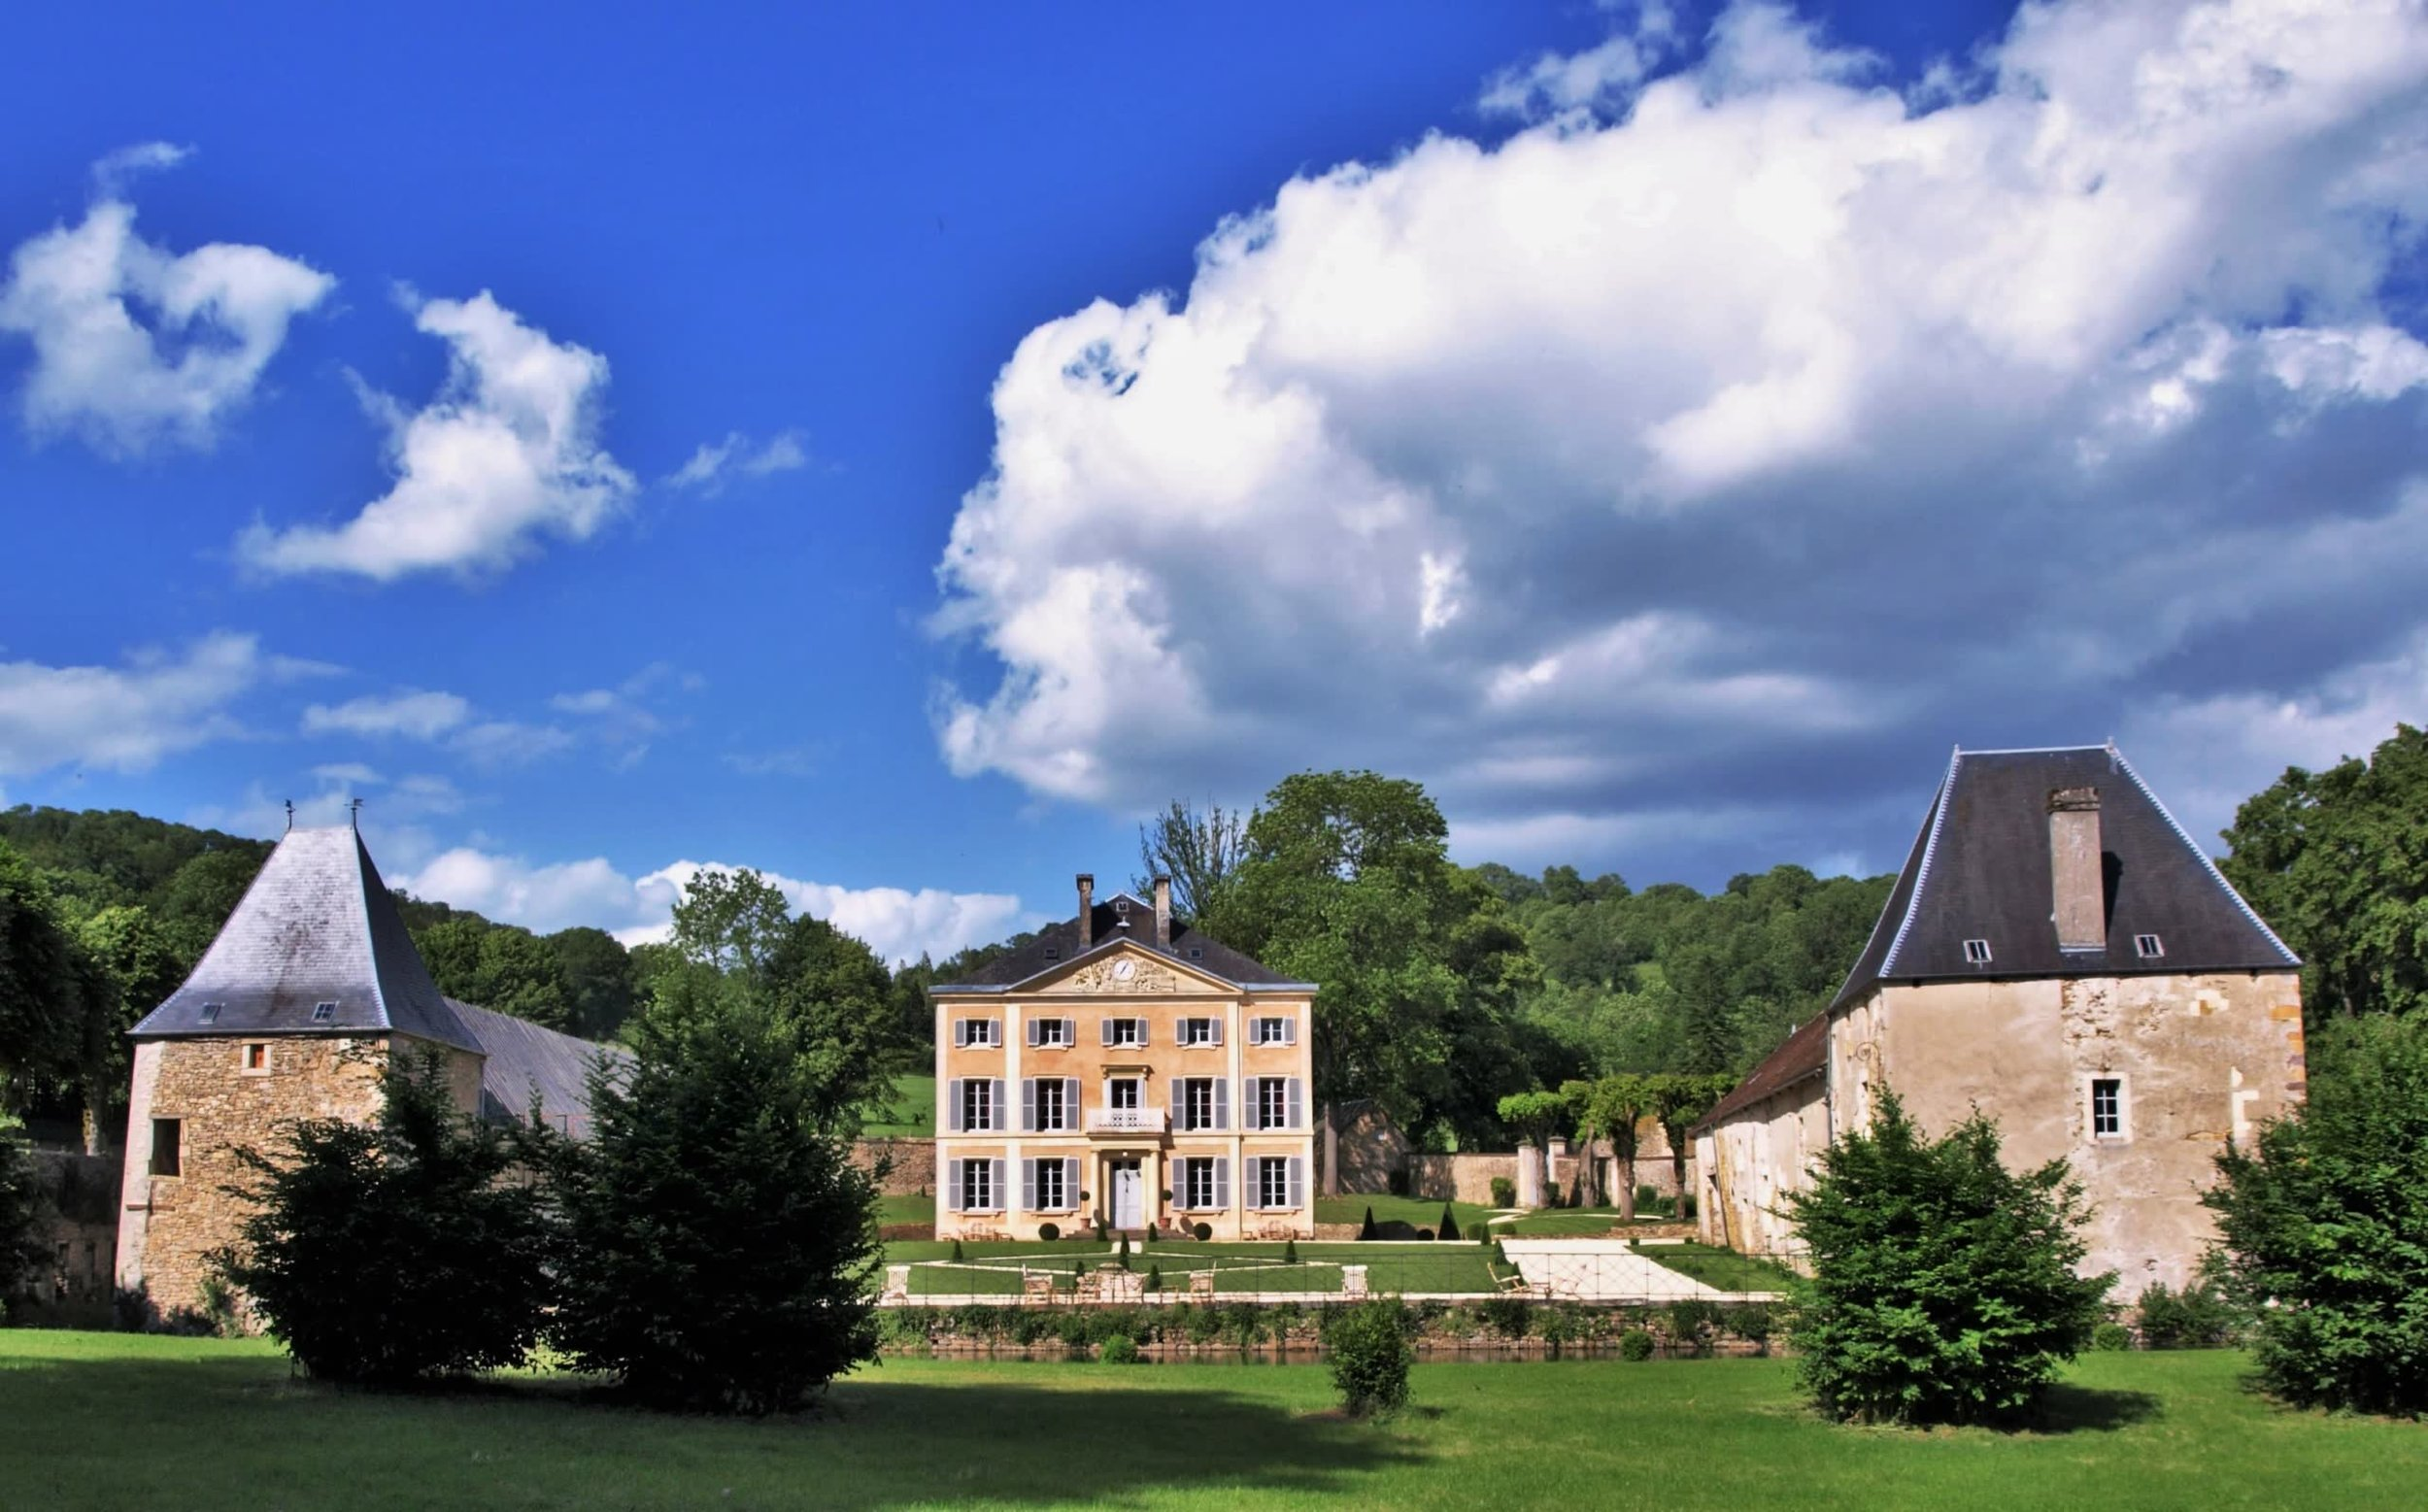 Chateau de la Pommeraye - charming boutique hotel chateau b&b spa normandy calvados 3(2).jpg